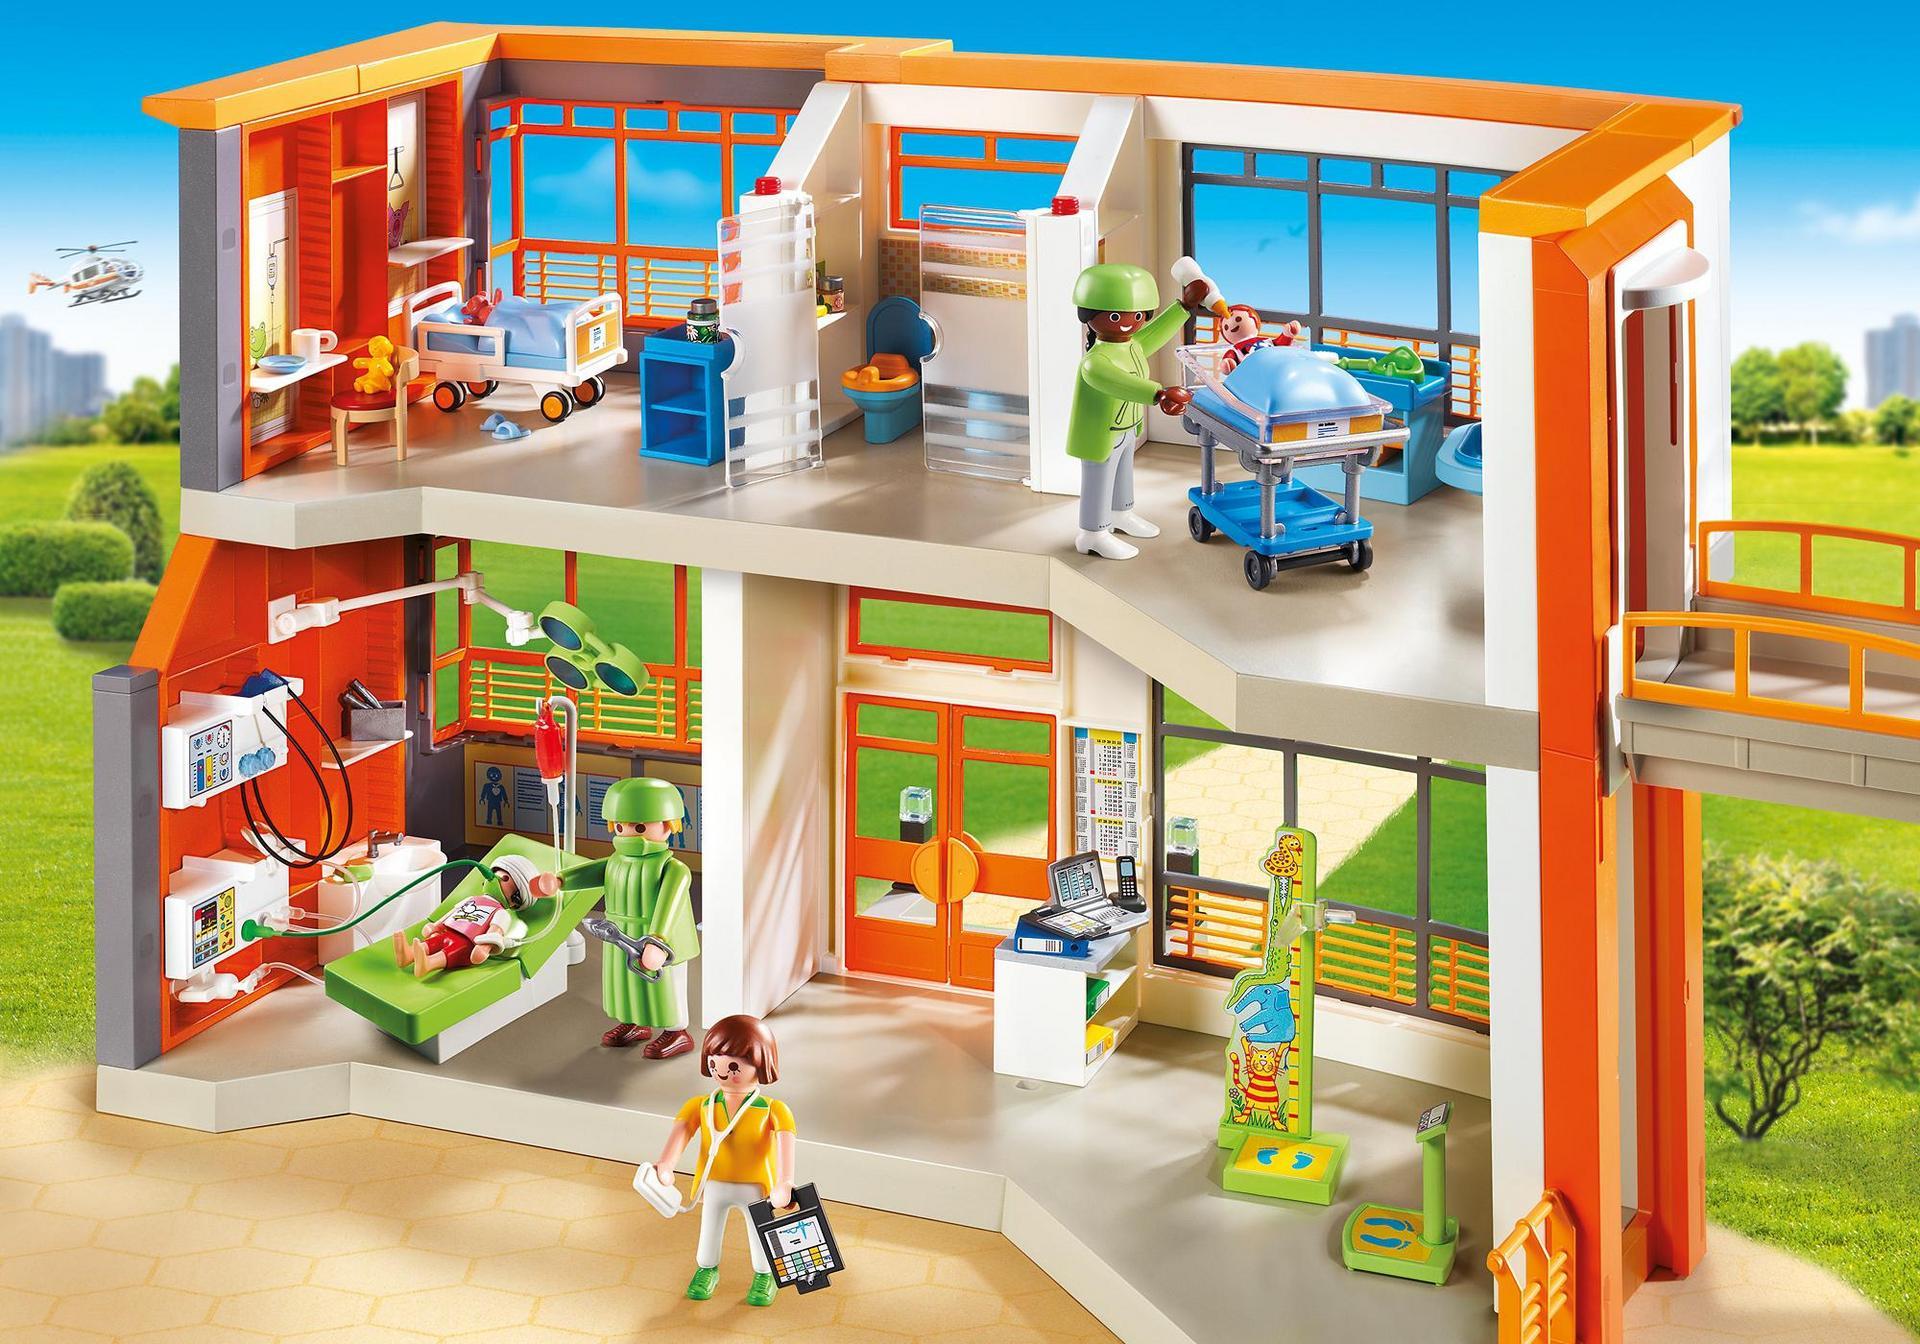 Compleet ingericht kinderziekenhuis 6657 playmobil for Playmobil 6445